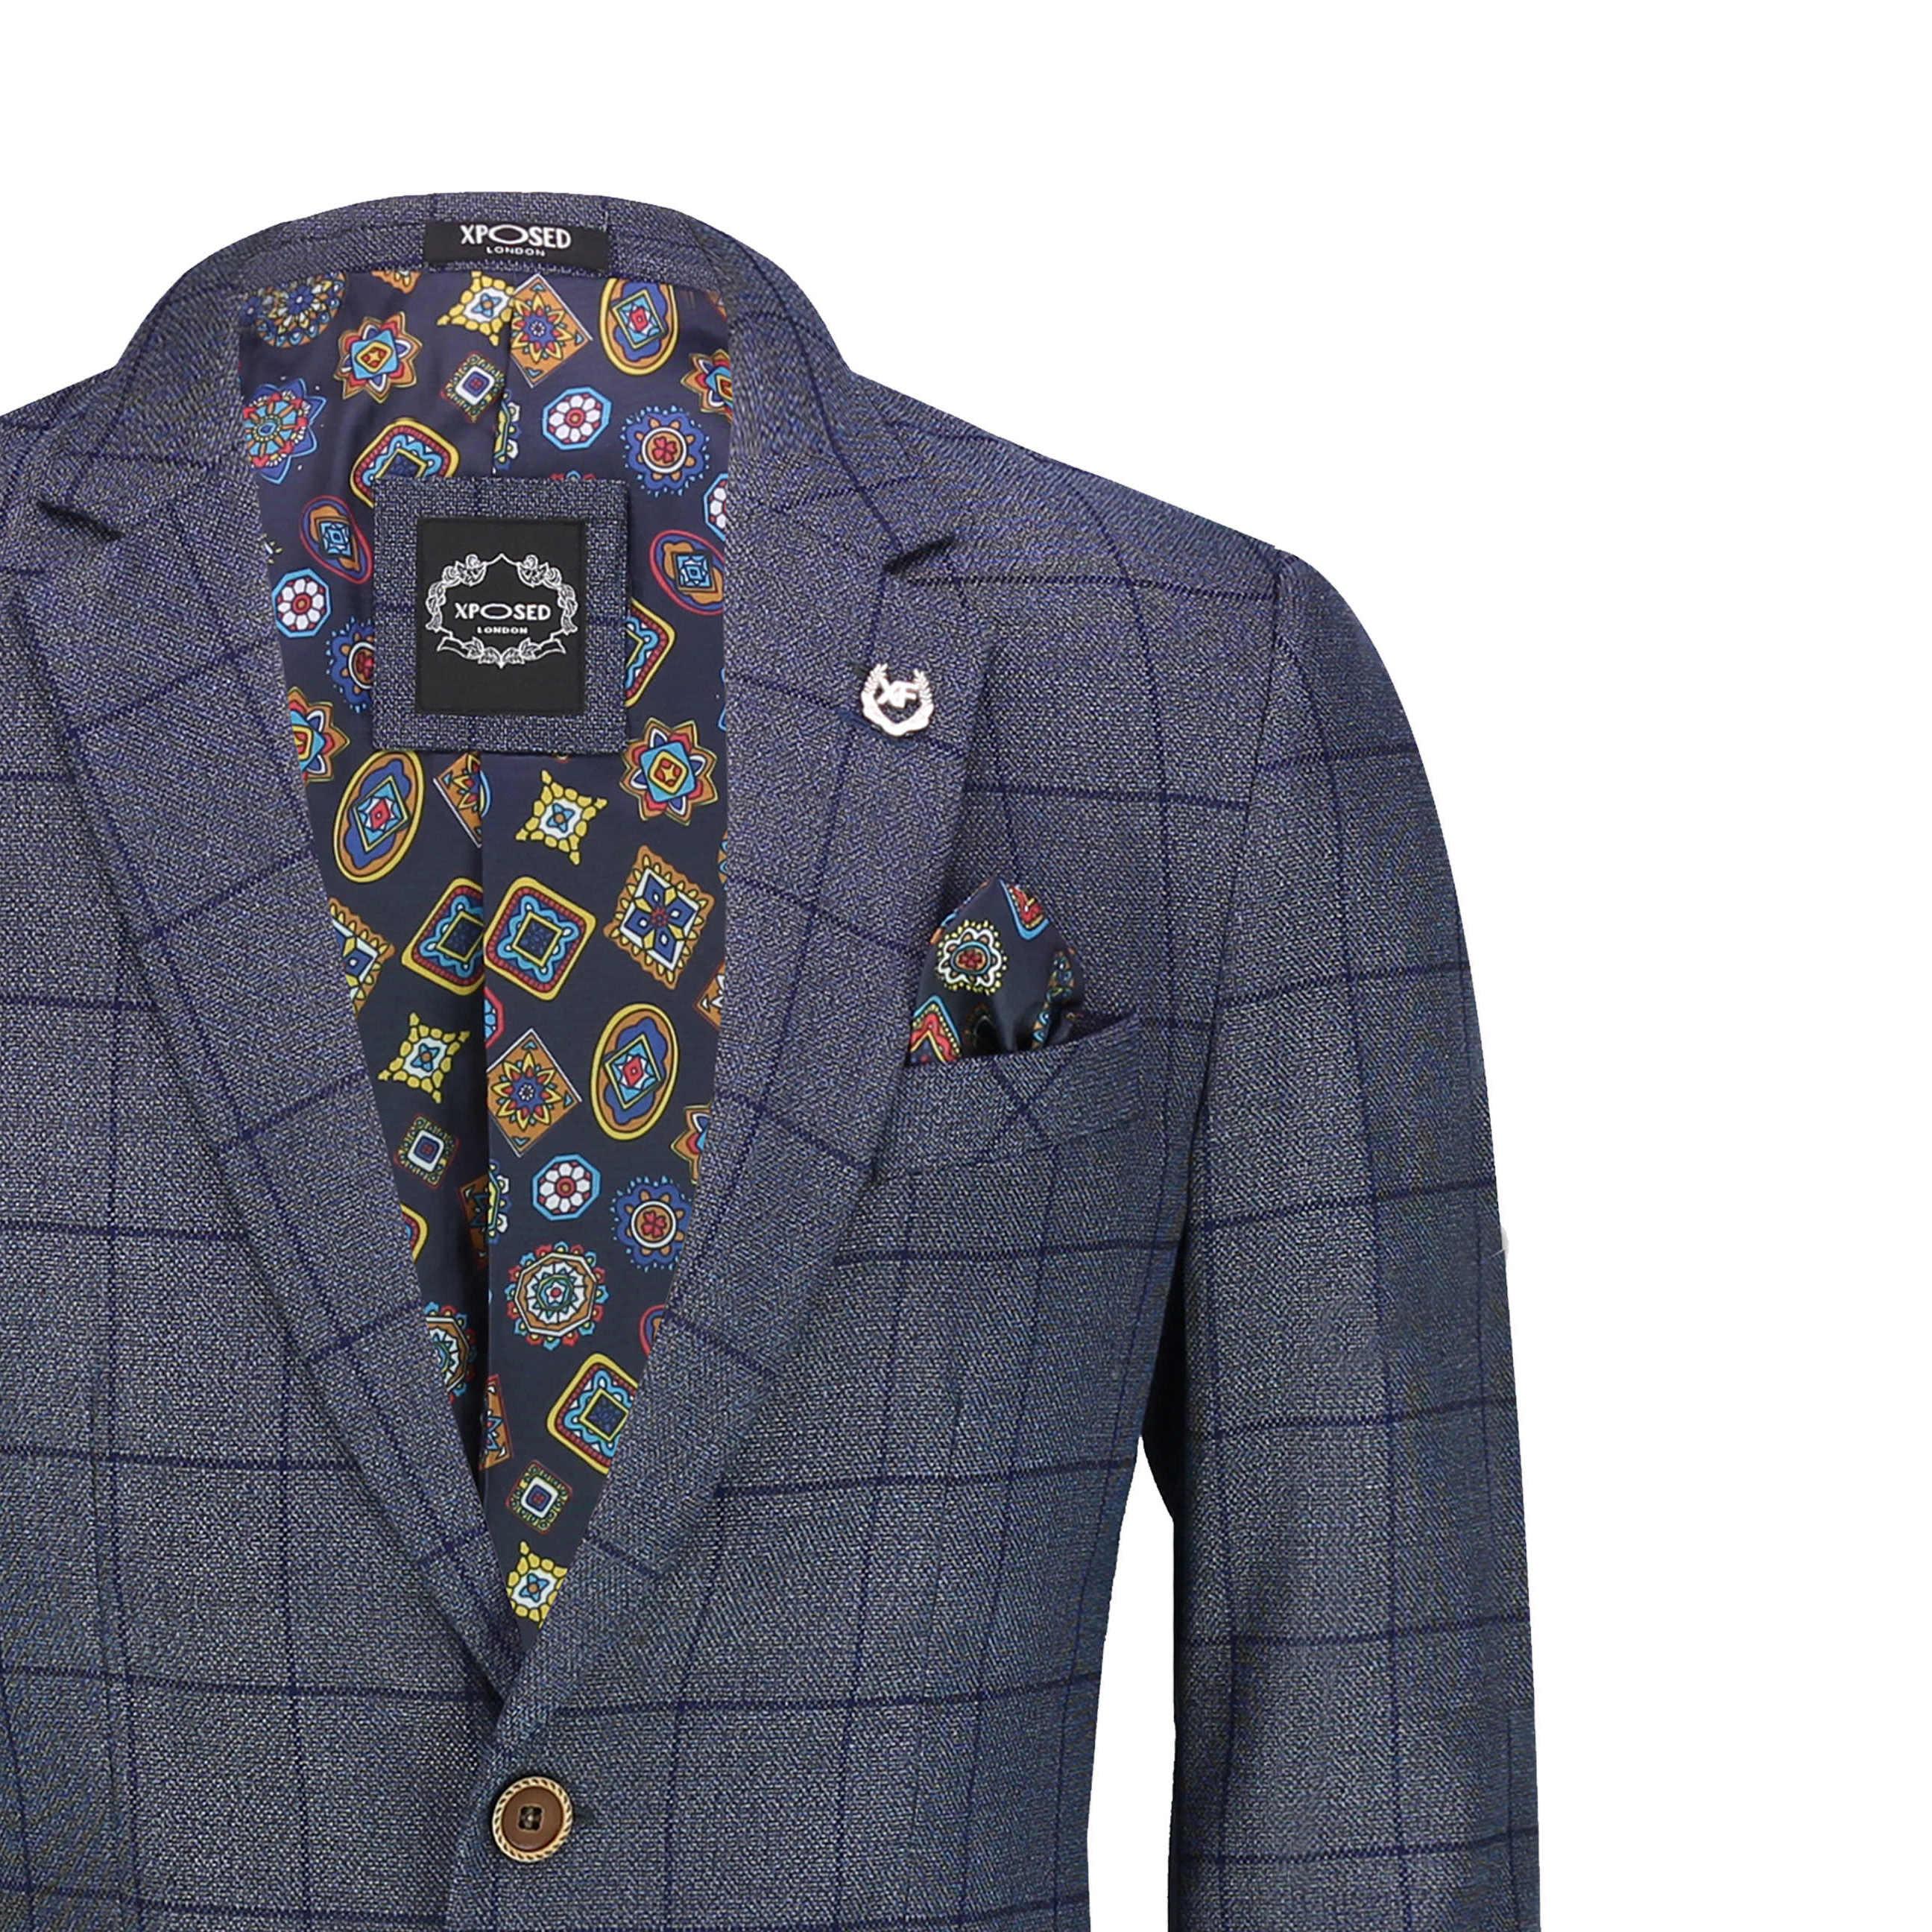 Mens Windowpane Check Suit Jacket Retro Tailored Fit Tweed Blazer Tan Oak Blue